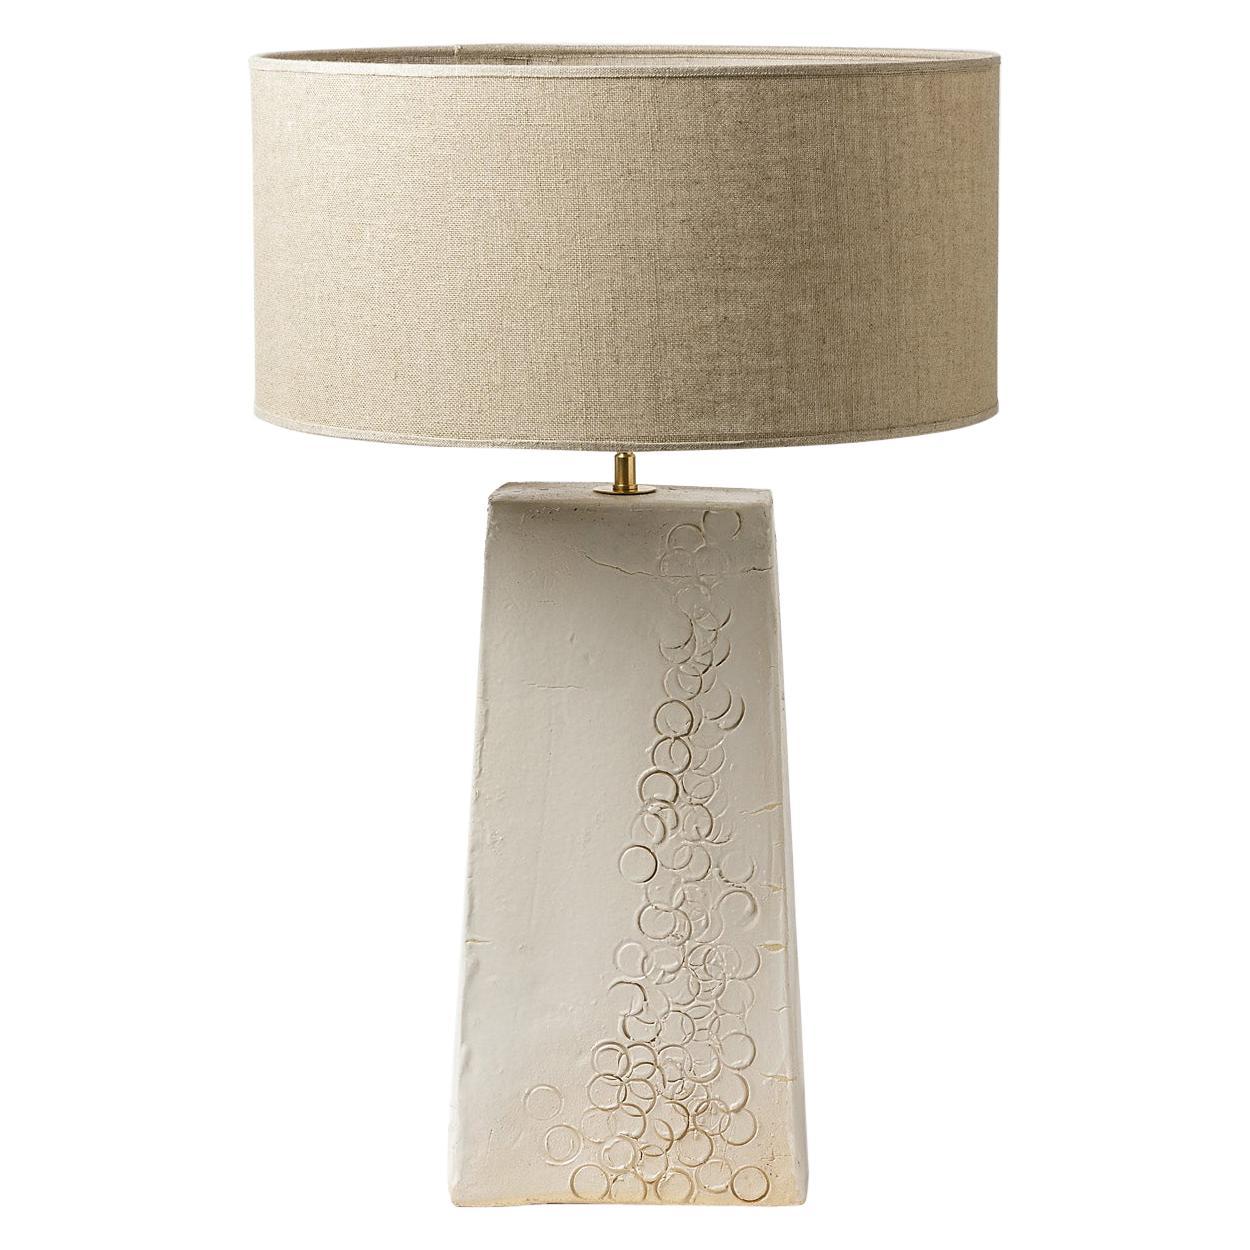 White Stoneware Ceramic Table Lamp 20th Century Design Lighting handmade